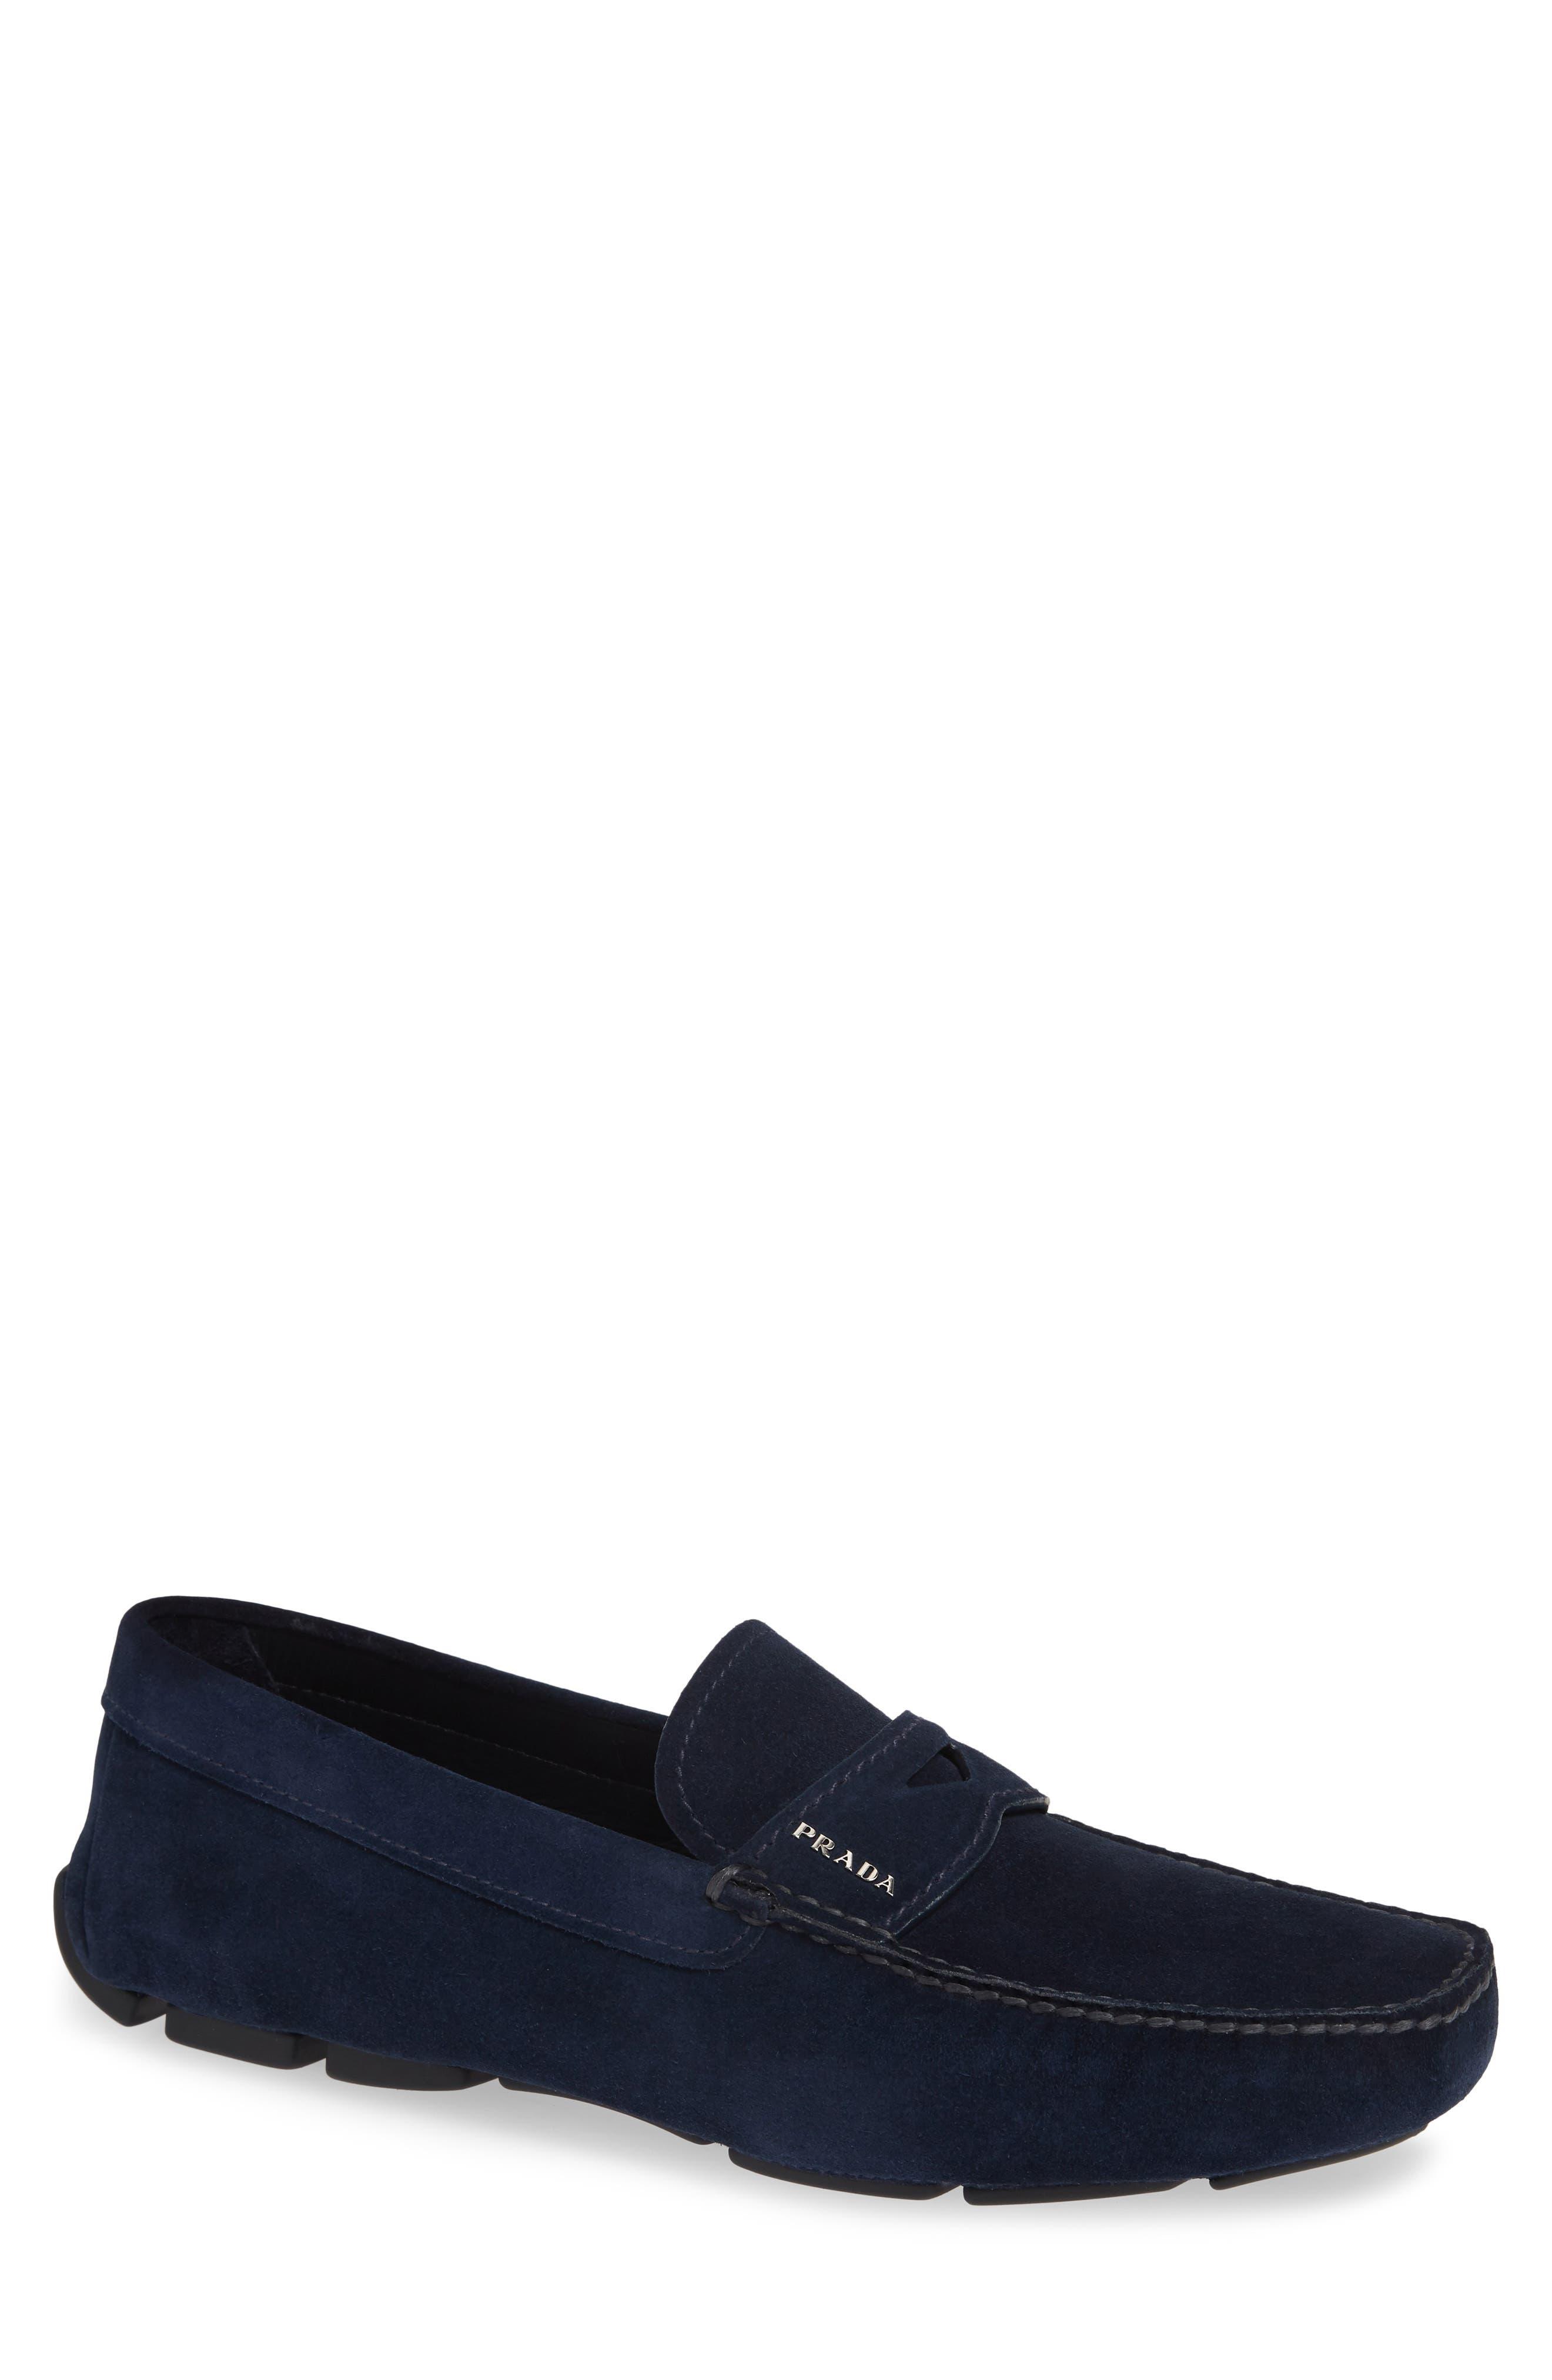 PRADA Driving Shoe, Main, color, OLTREMARE BLUE